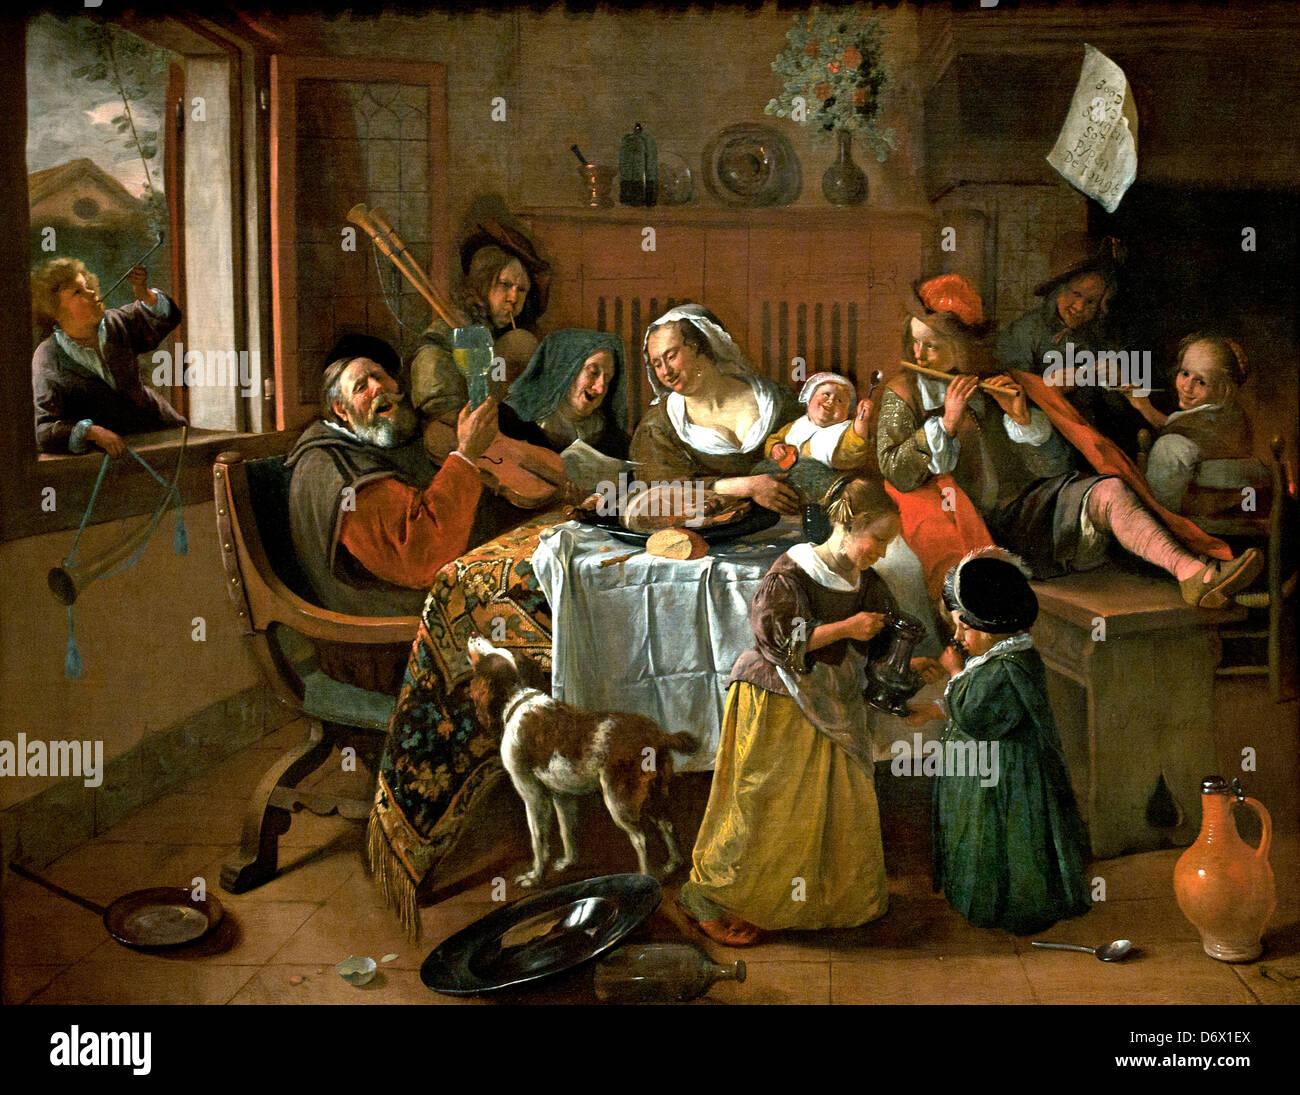 La feliz familia 1668 Jan Havickszoon Steen 1626 - 1679 Países Bajos Holanda Holandesa Imagen De Stock